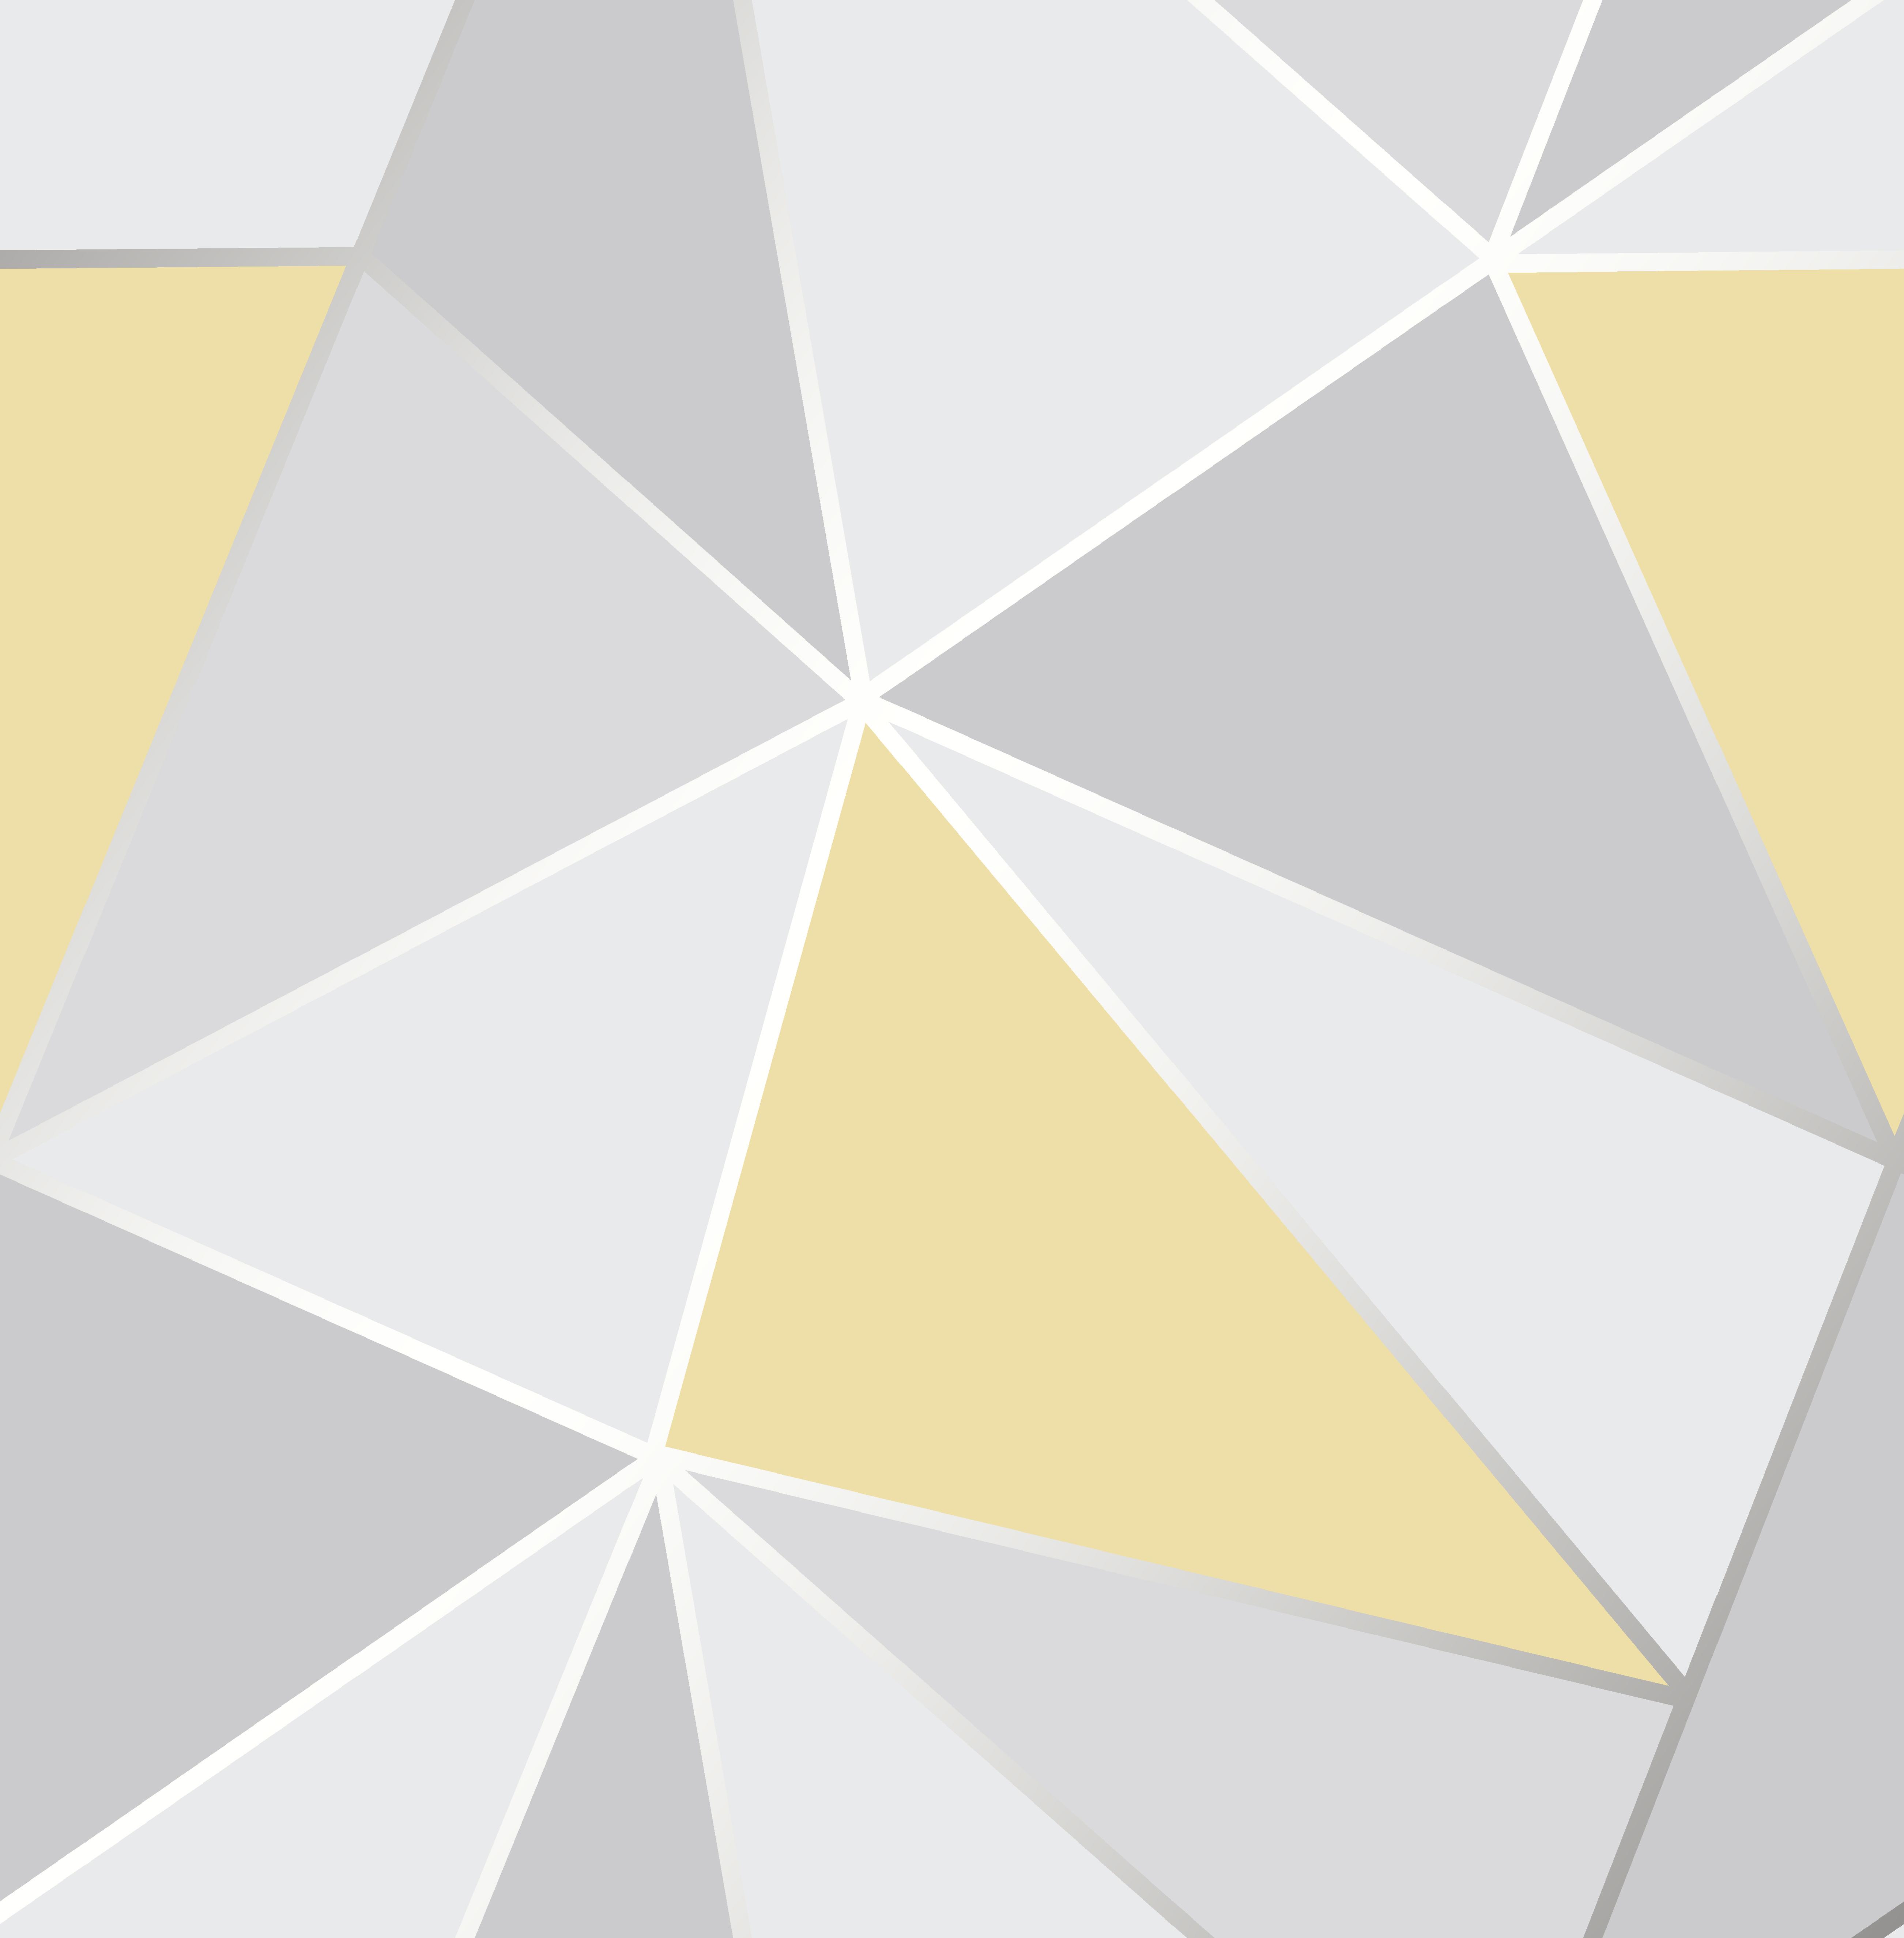 Geometric Wallpaper 3D Apex Triangle Modern Futuristic